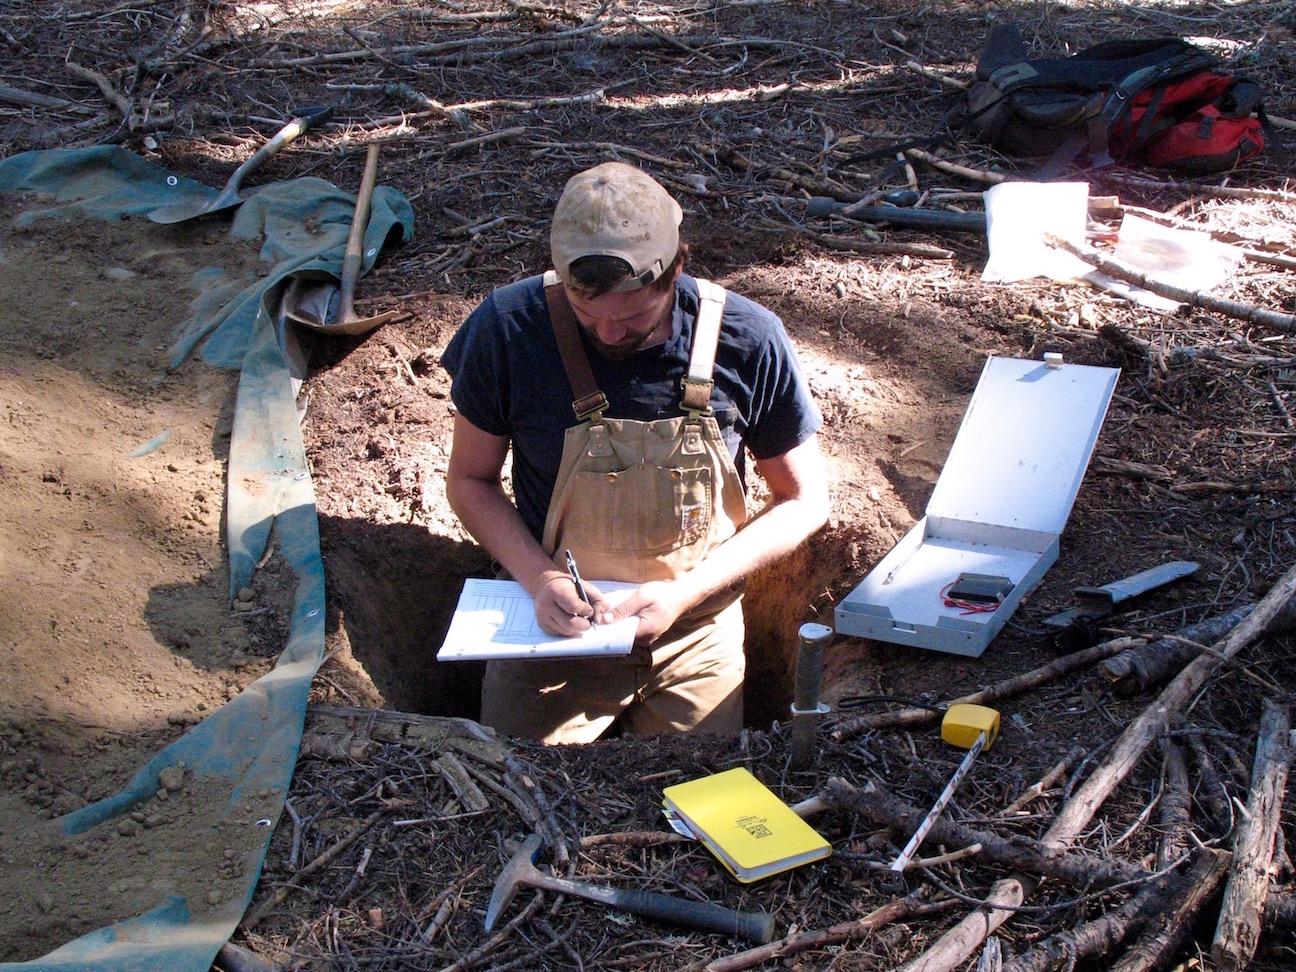 scientist samples soil and rocks